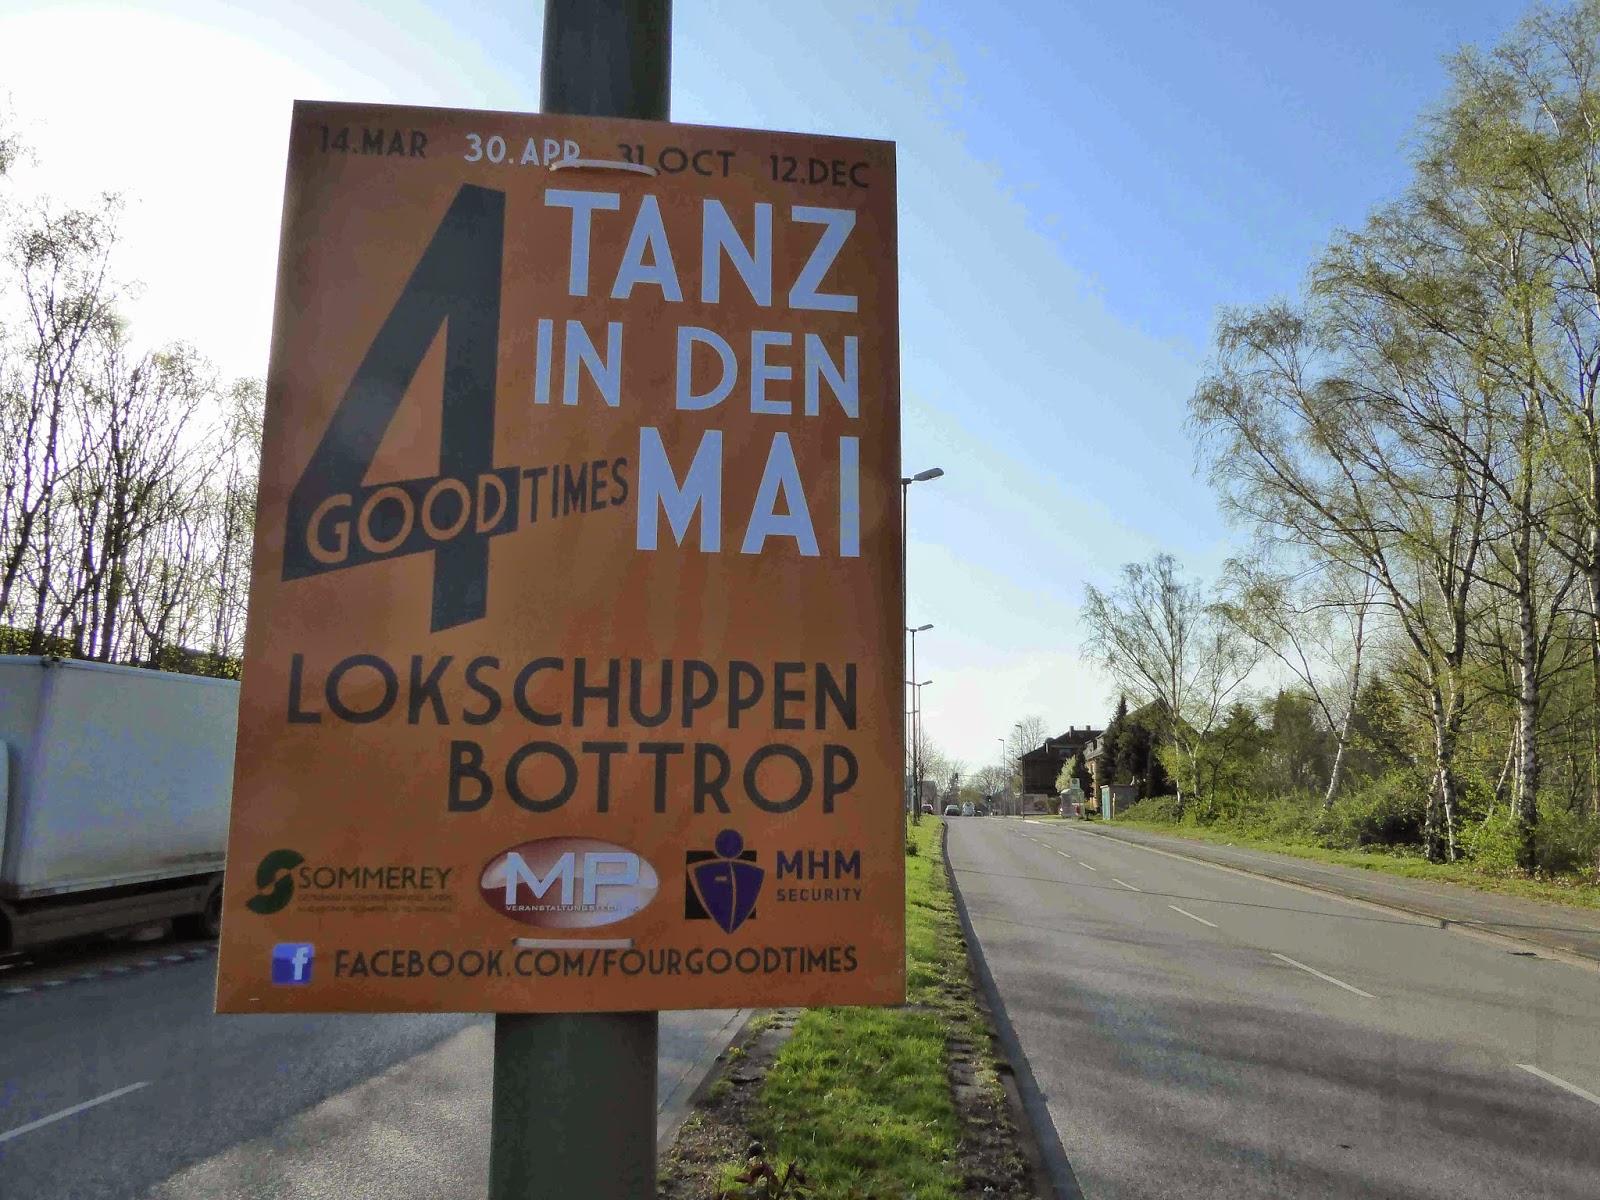 http://www.lokschuppen-bottrop.de/